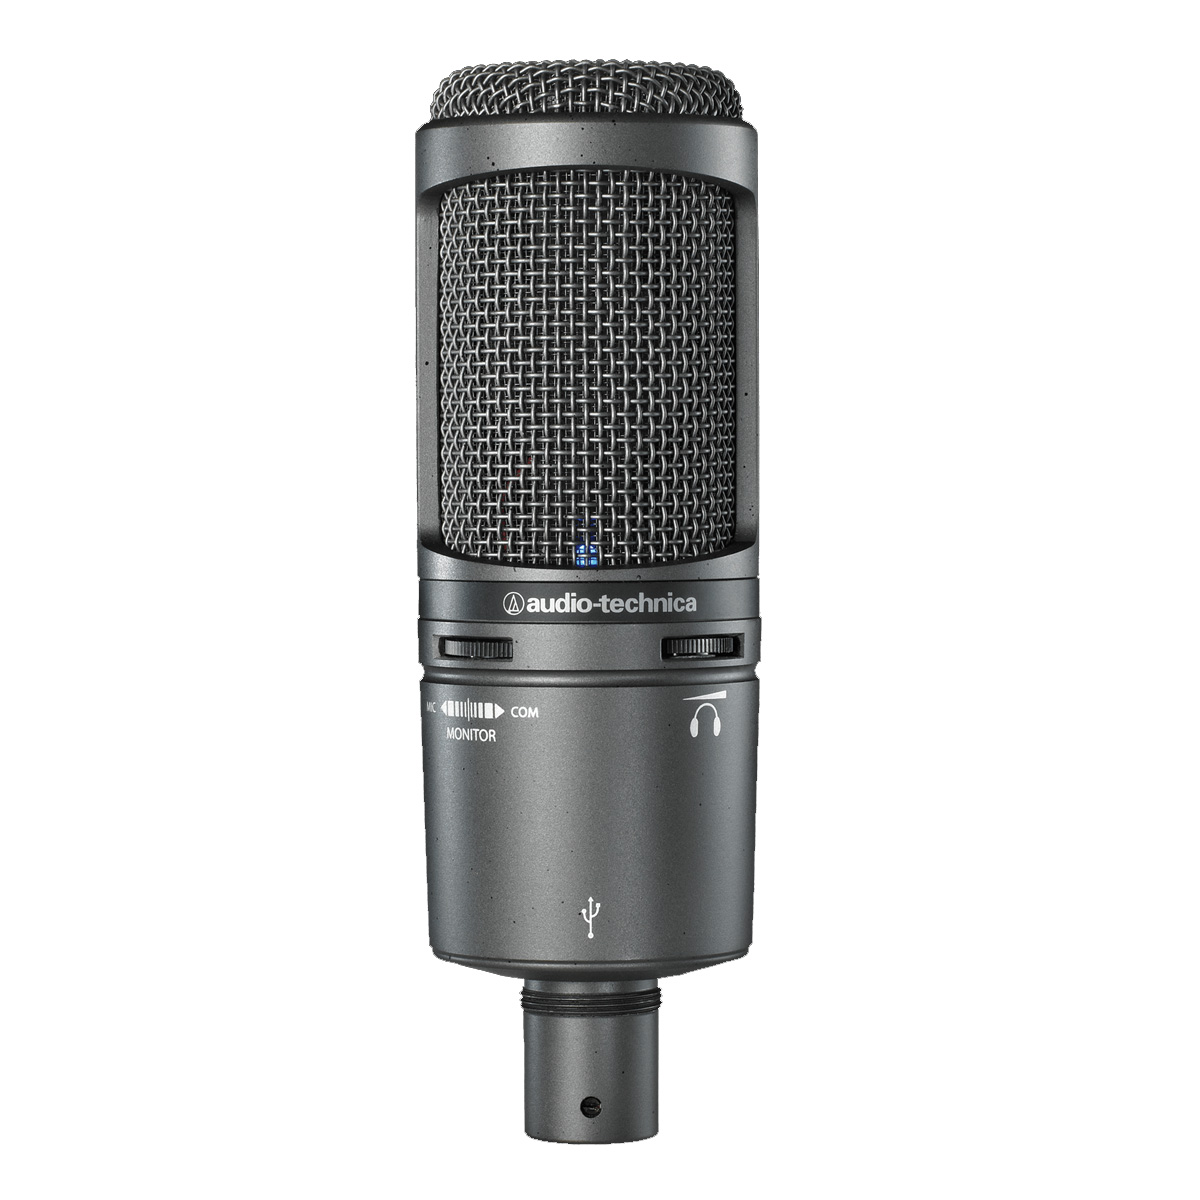 Microfone condensador USB Audio Technica AT2020USB+